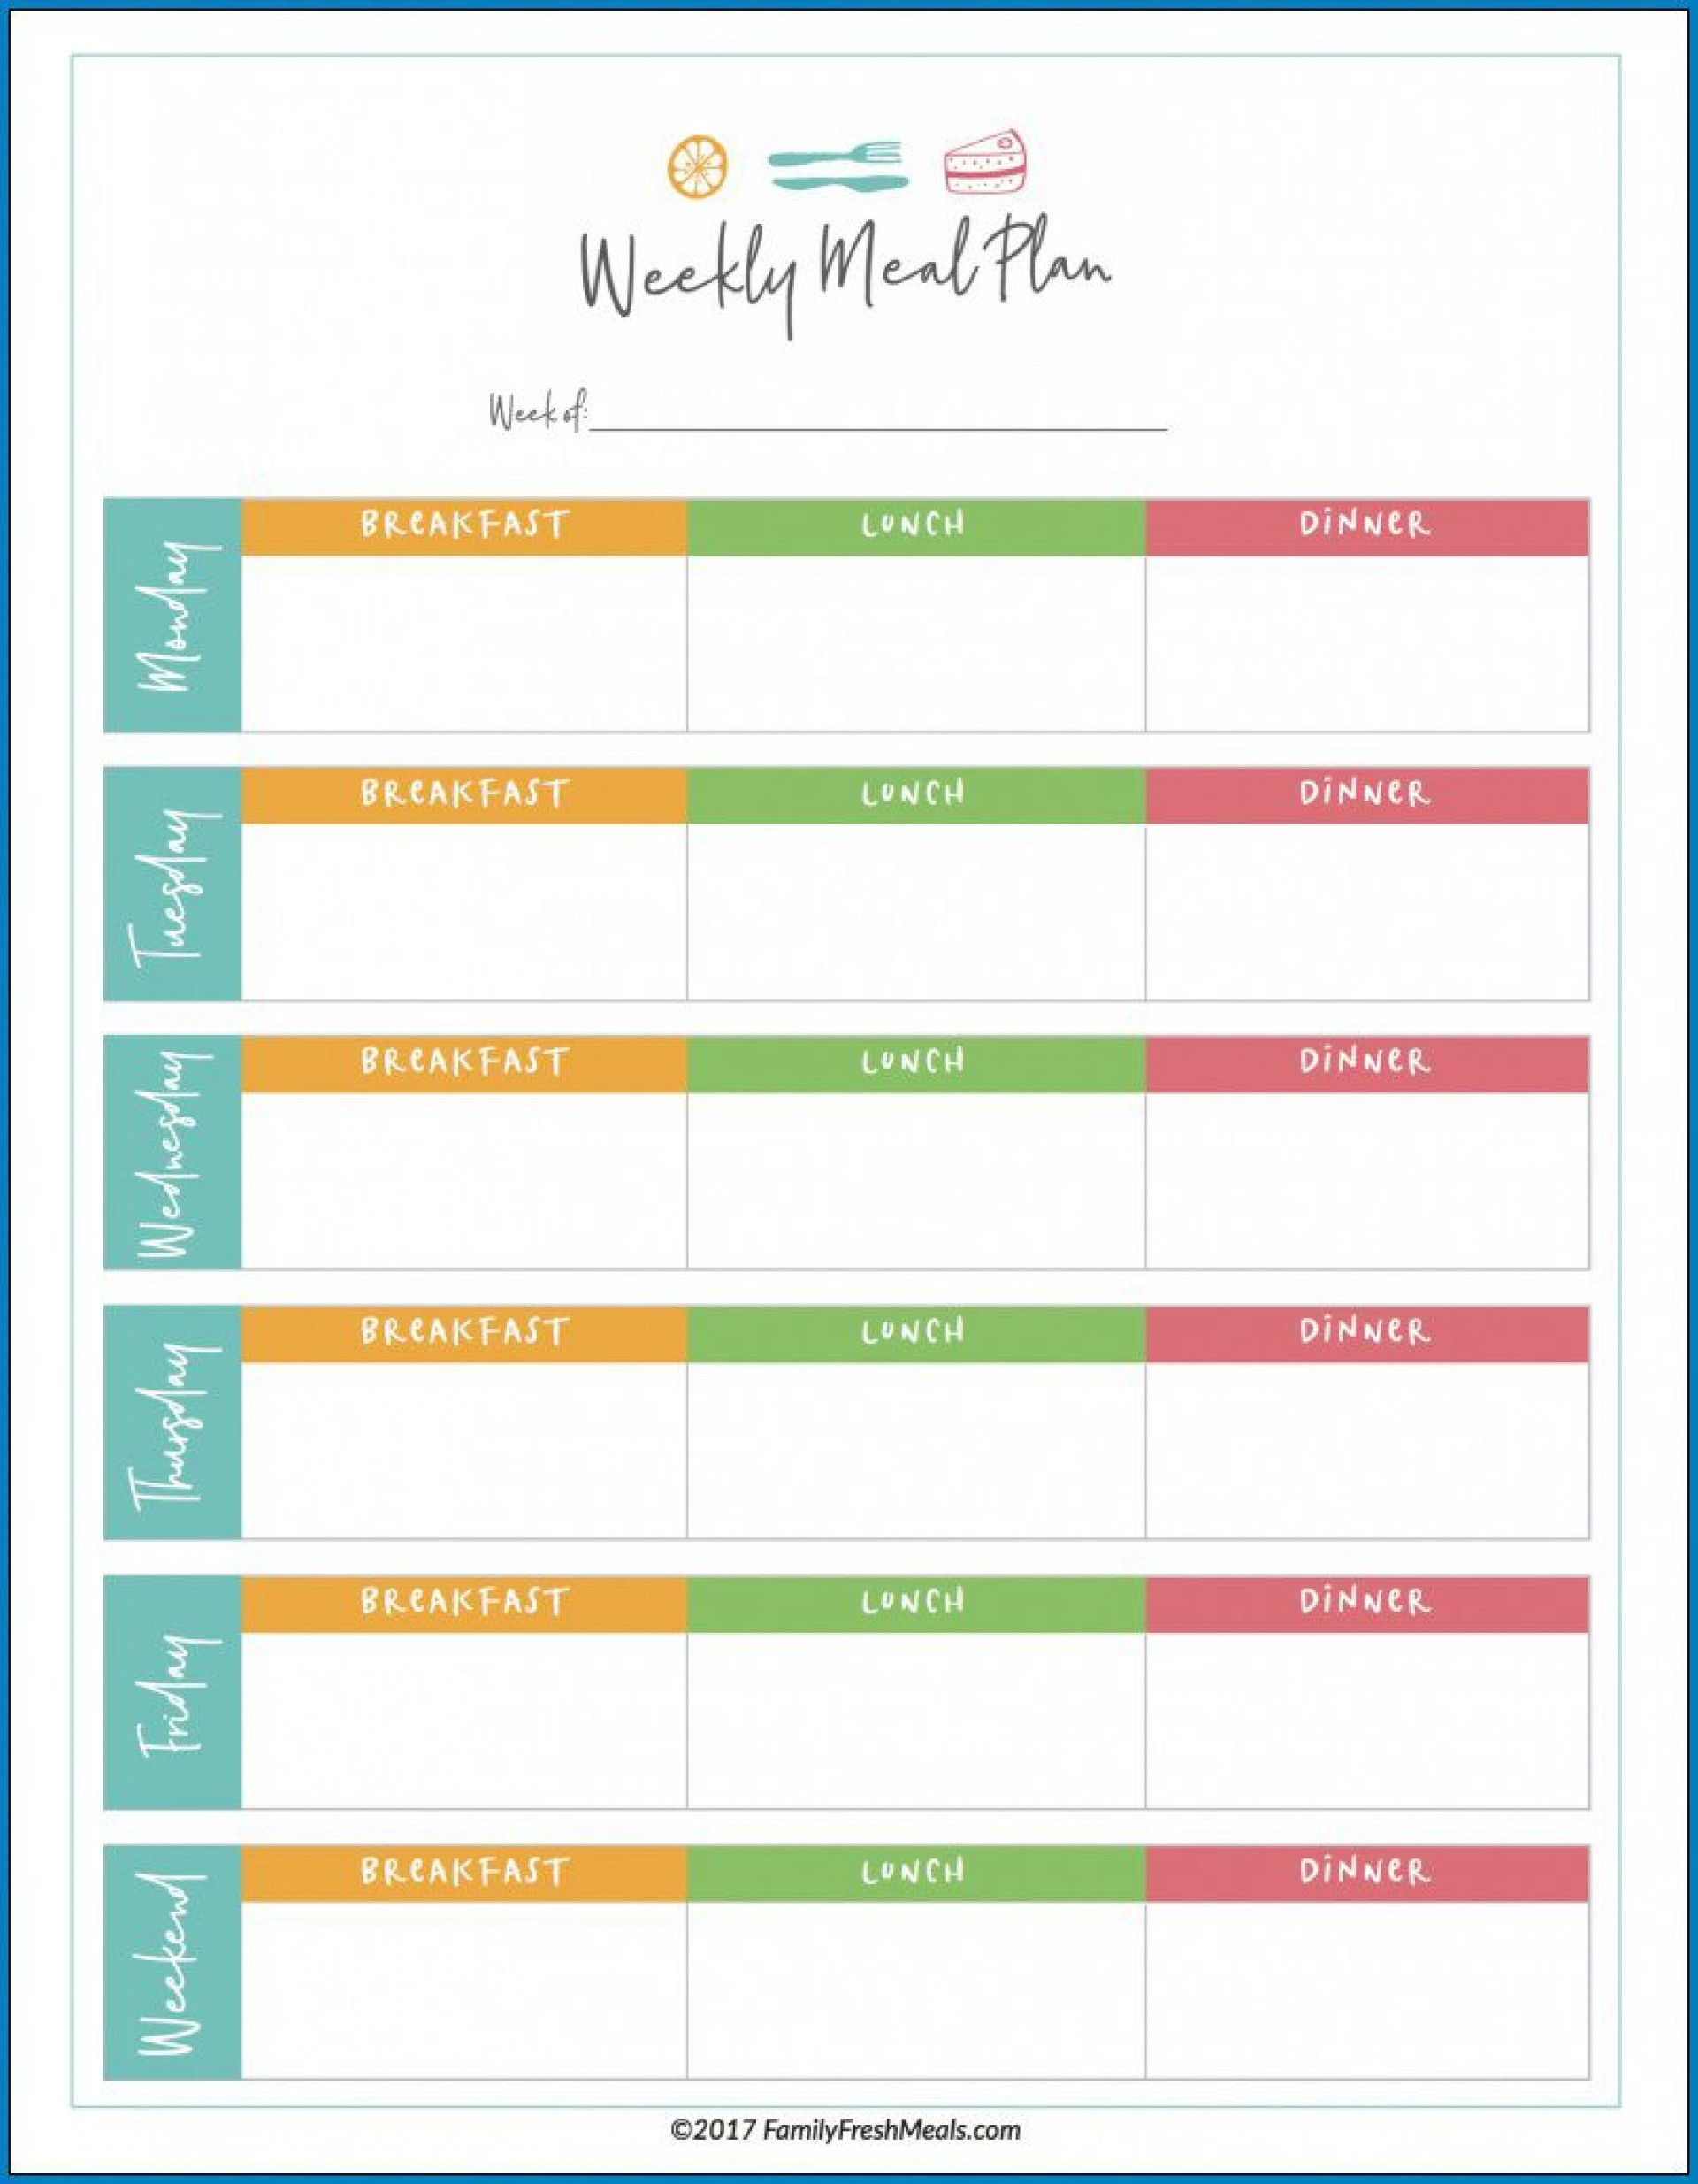 009 Incredible Meal Plan Template Excel Sample  Monthly Macro1920